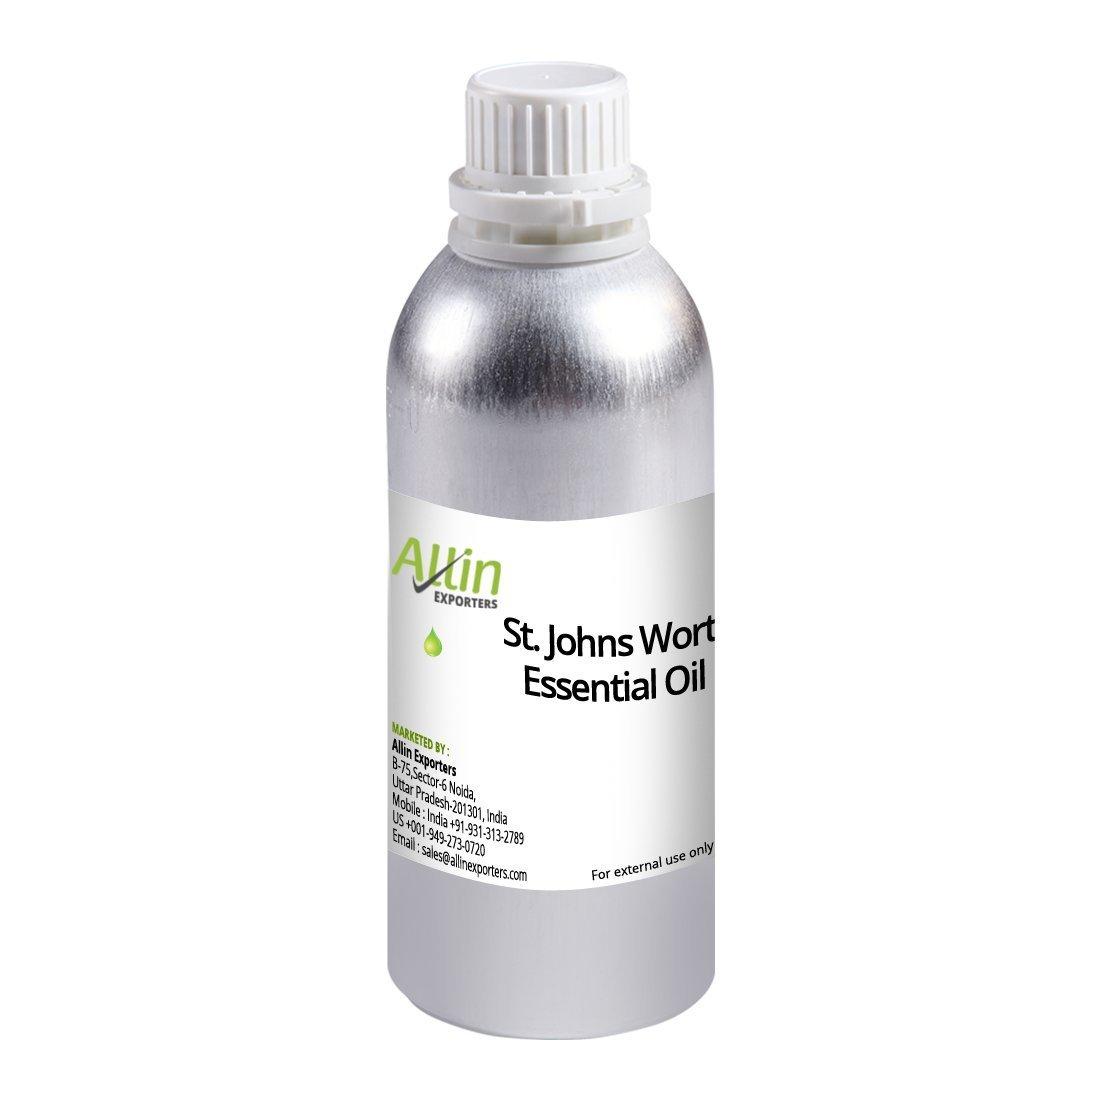 St. Johns Wort Essential Oil: The Skin's Best Friend